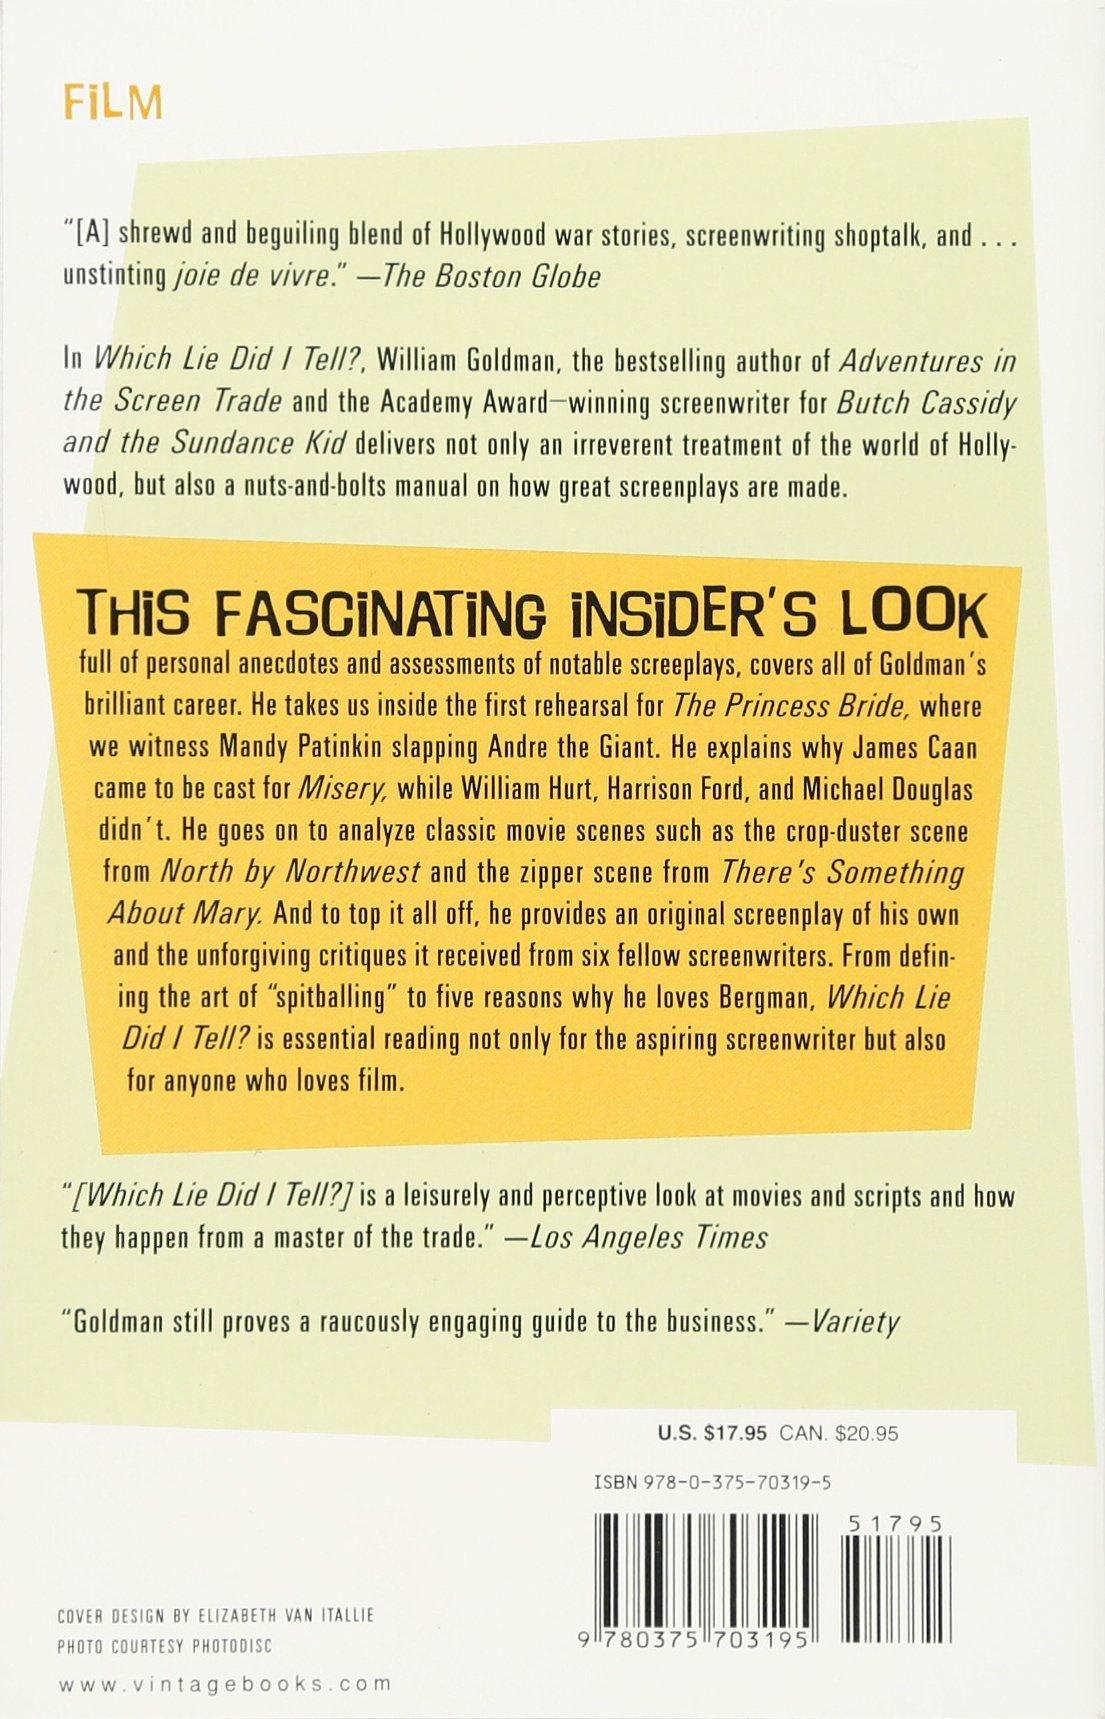 More Adventures in the Screen Trade: William Goldman: 9780375703195:  Amazon.com: Books